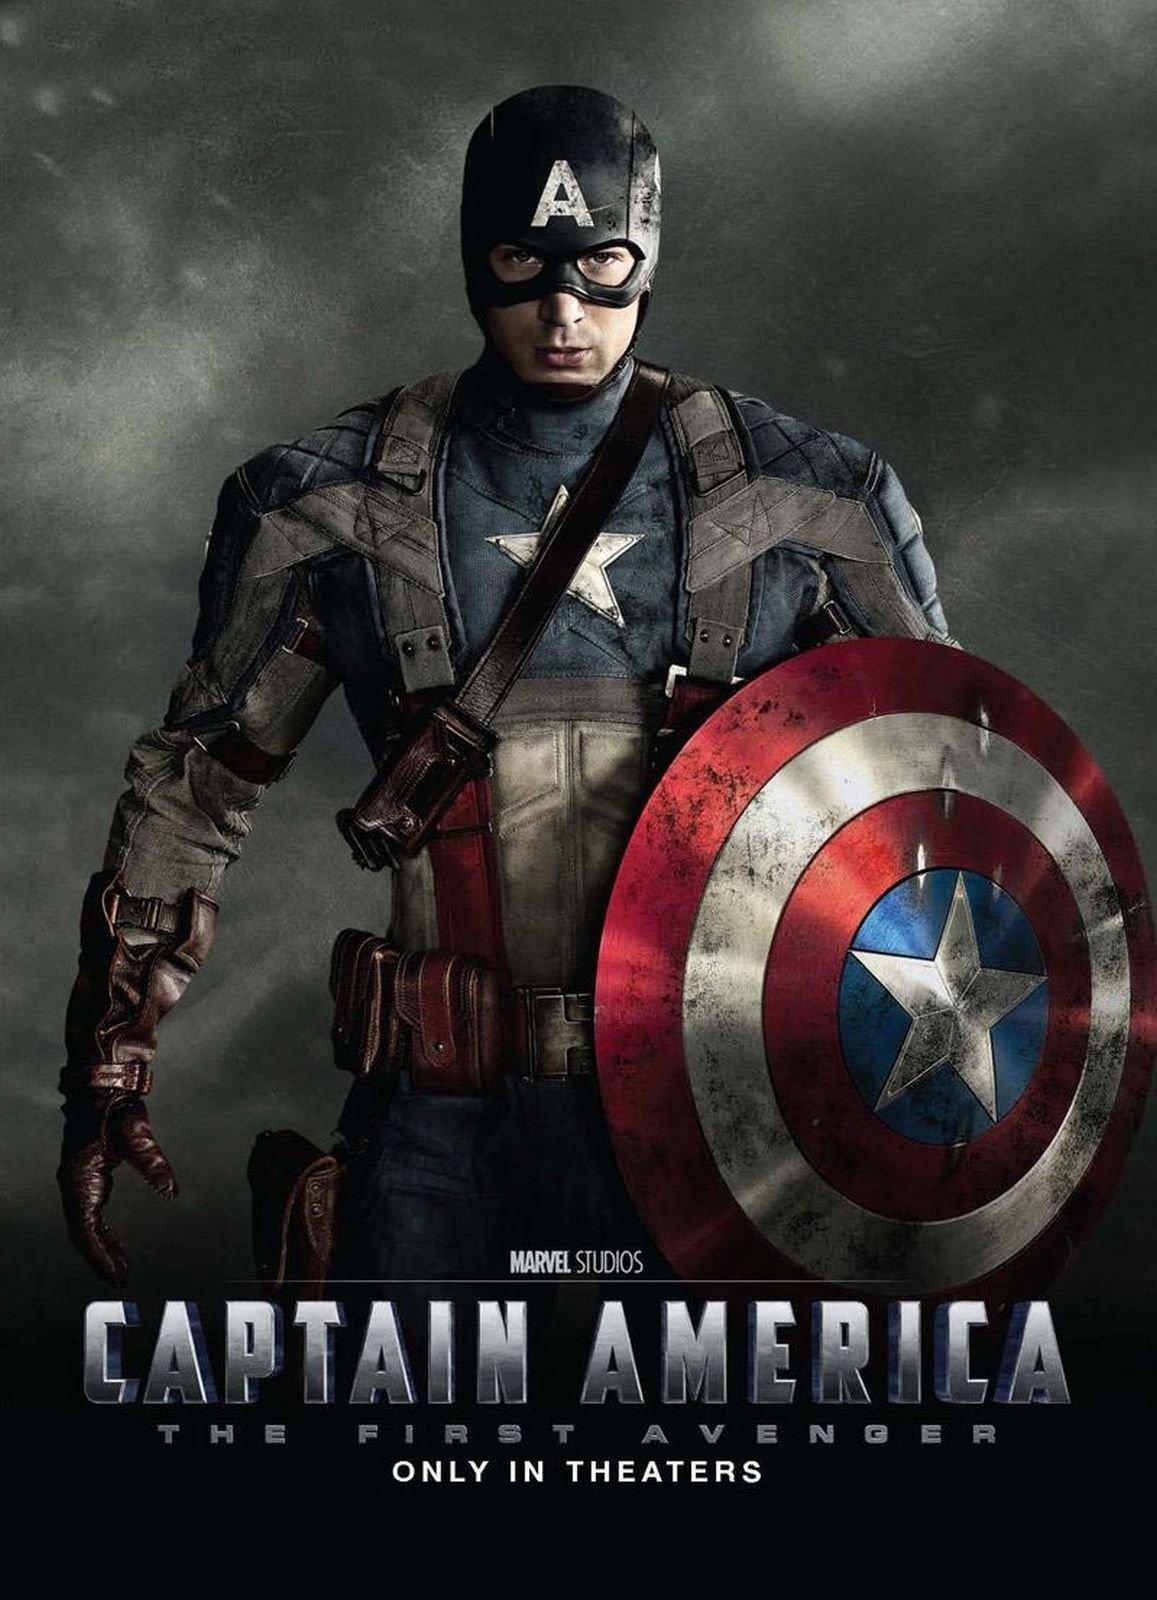 Captain america the first avenger 2011 poster freemovieposters